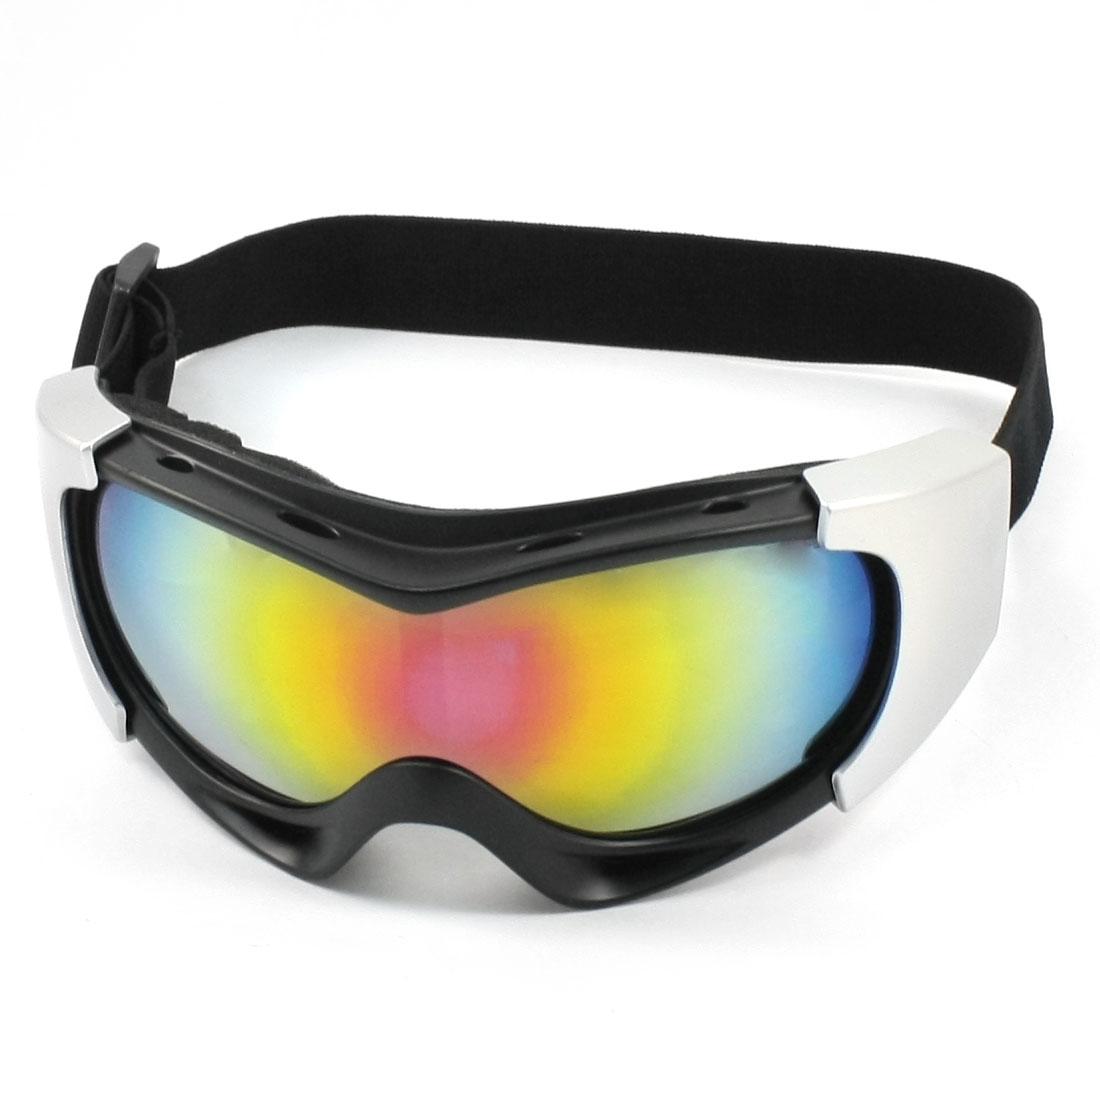 Unisex Multicolor Lens Full Frame Plastic Snow Ski Goggles